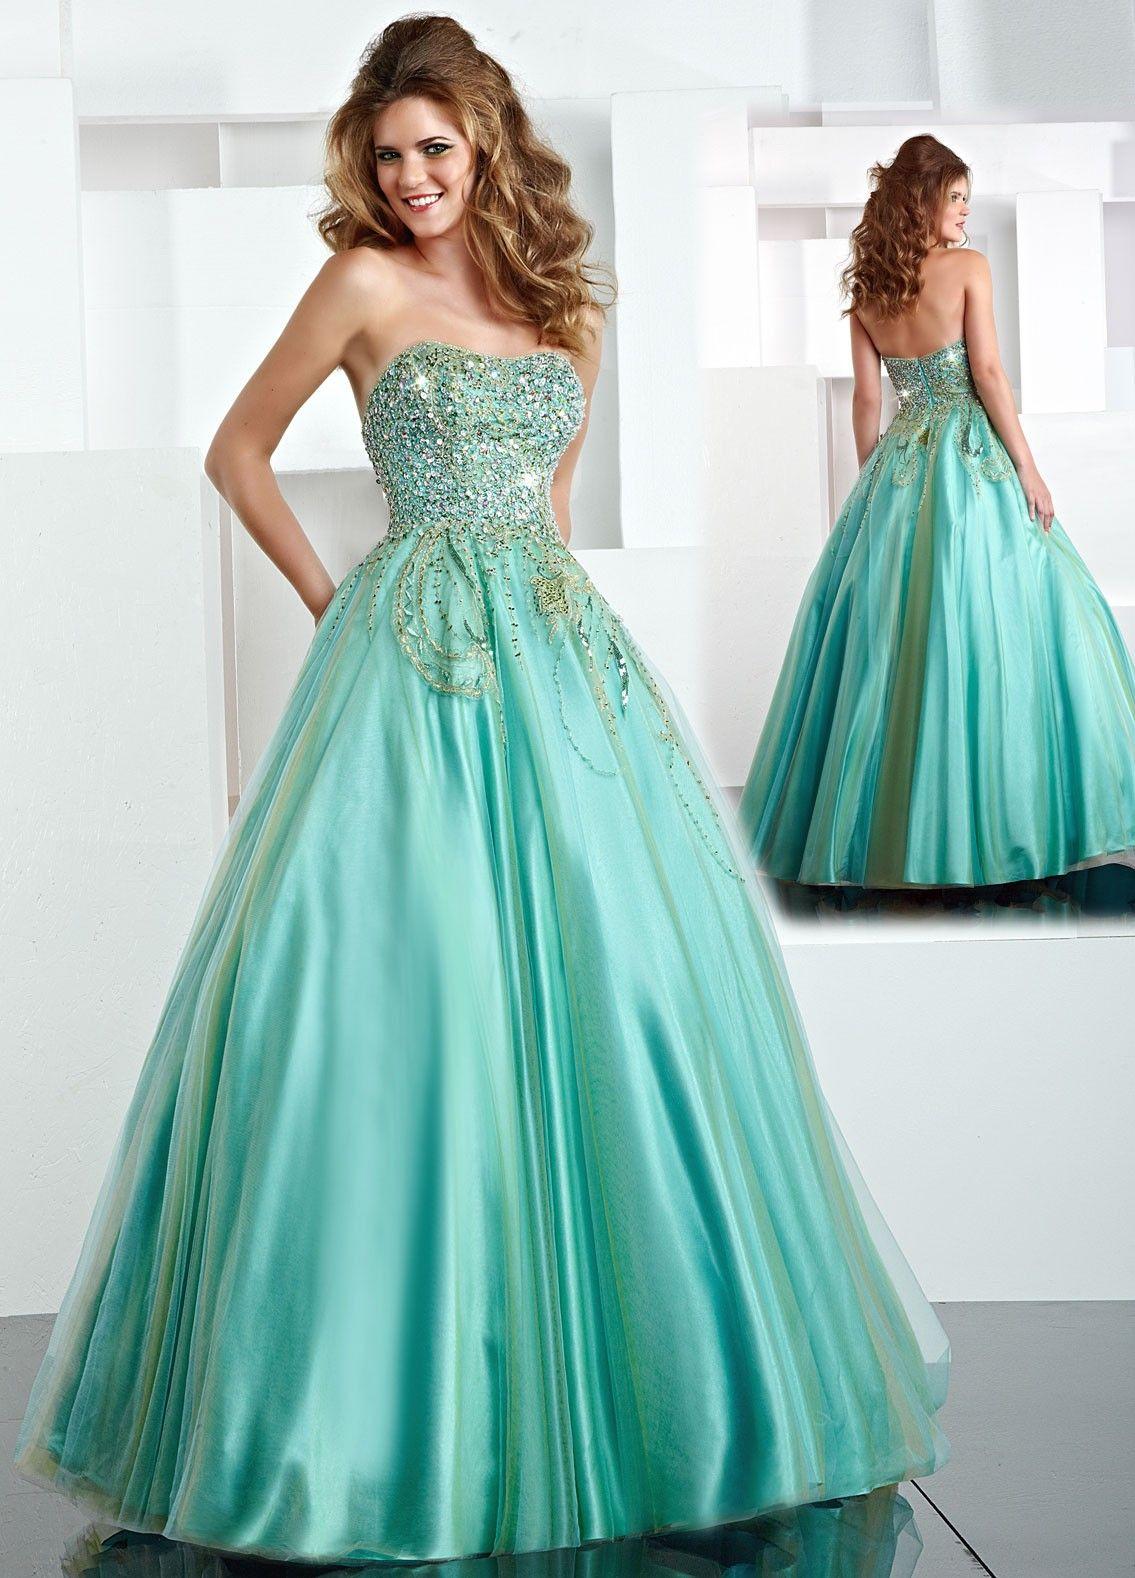 hand beaded bodice long prom dress wedding dresses uk shop | Prom ...